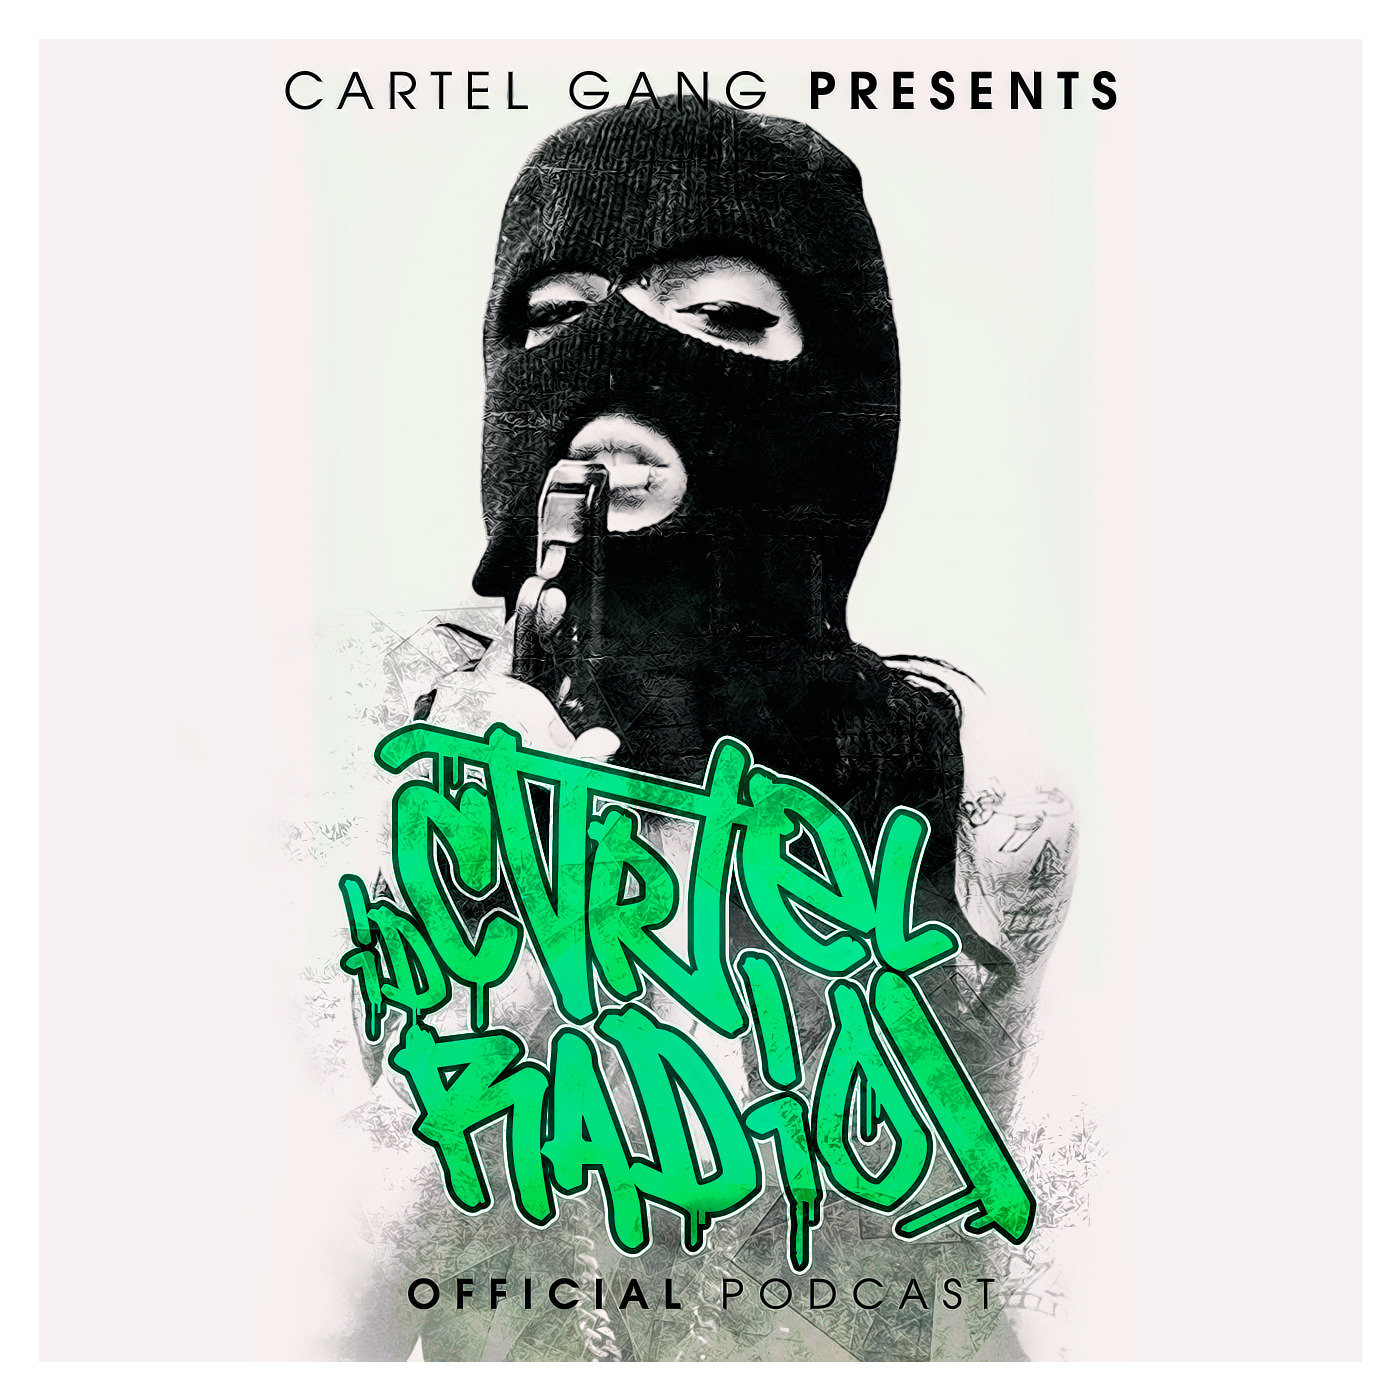 <![CDATA[Cartel ID Radio (Official Podcast)]]>